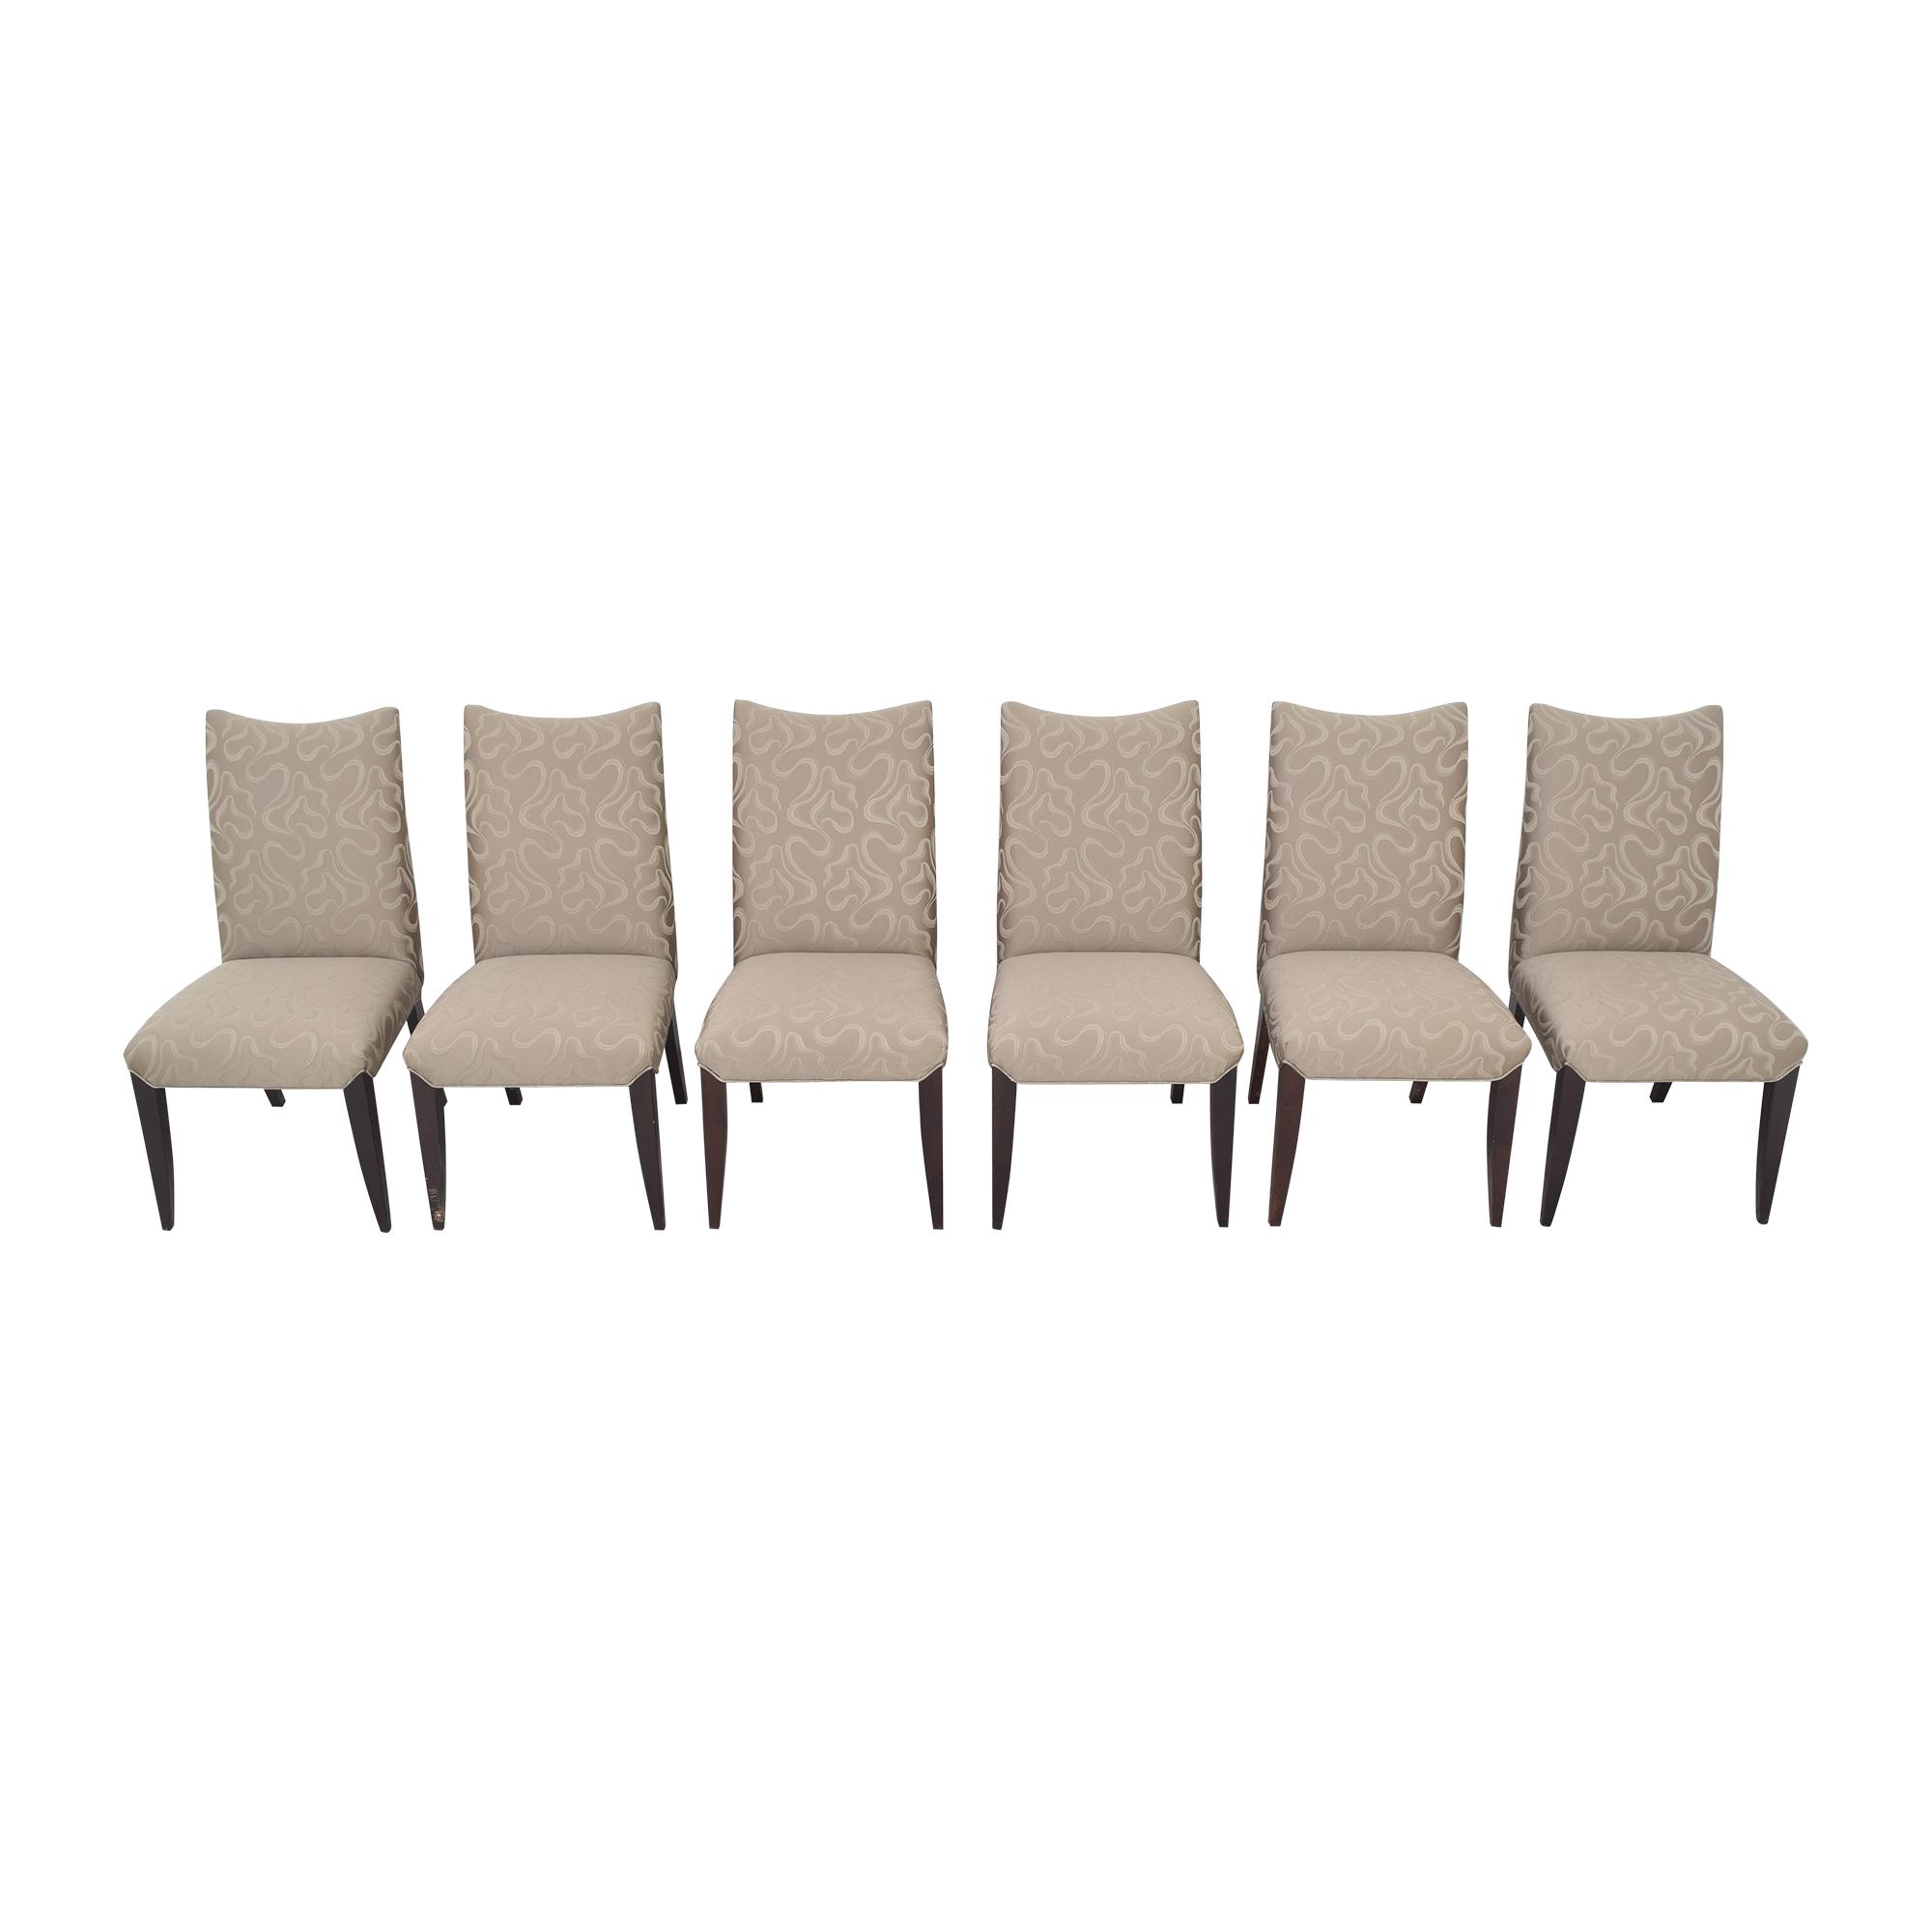 buy Precedent Furniture Precedent Furniture Upholstered Dining Chairs online